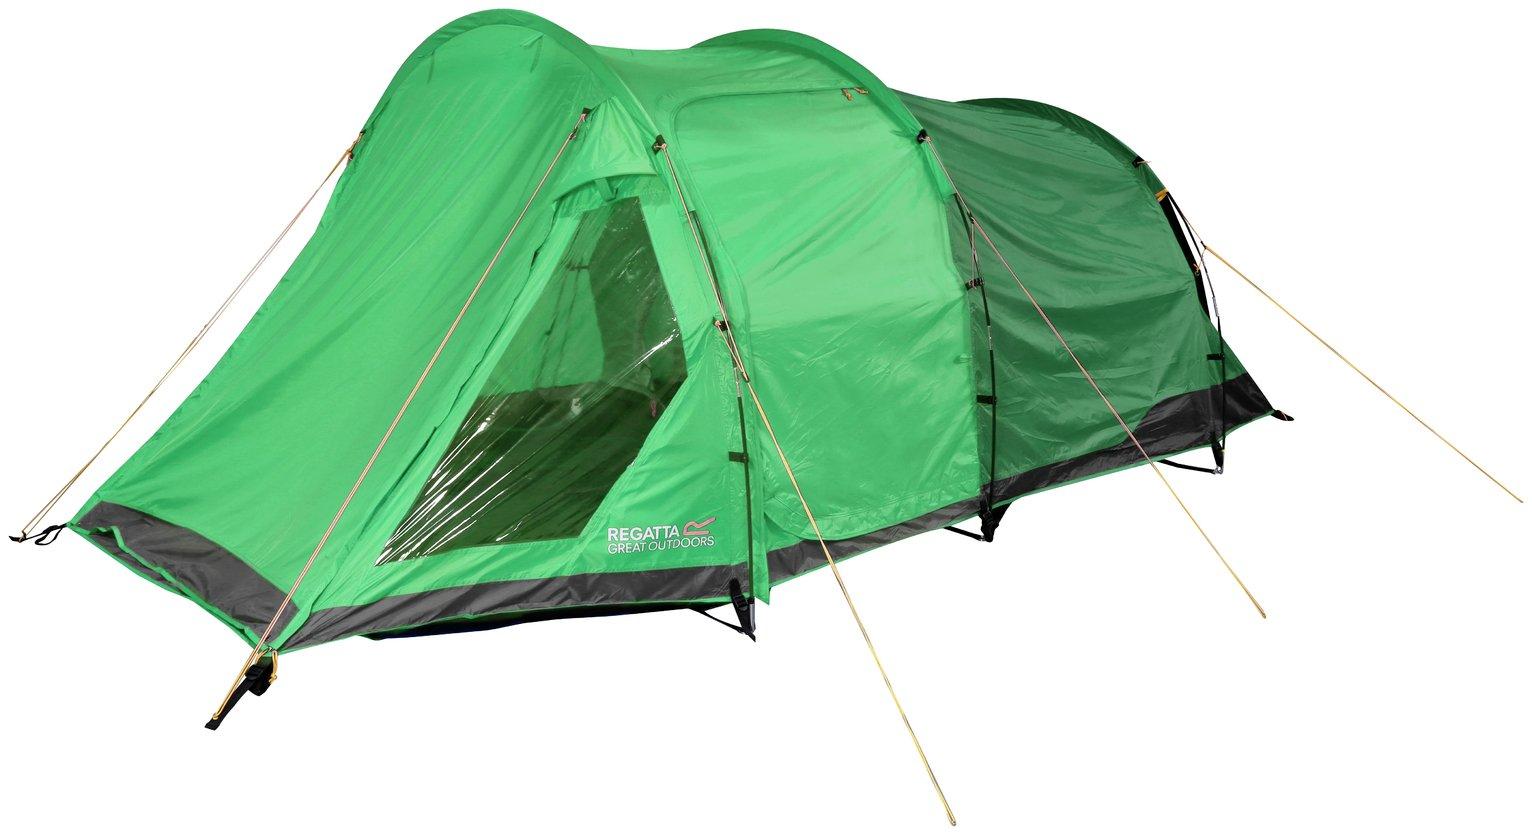 Regatta Vester 4 Man 2 Room Tent - Extreme Green